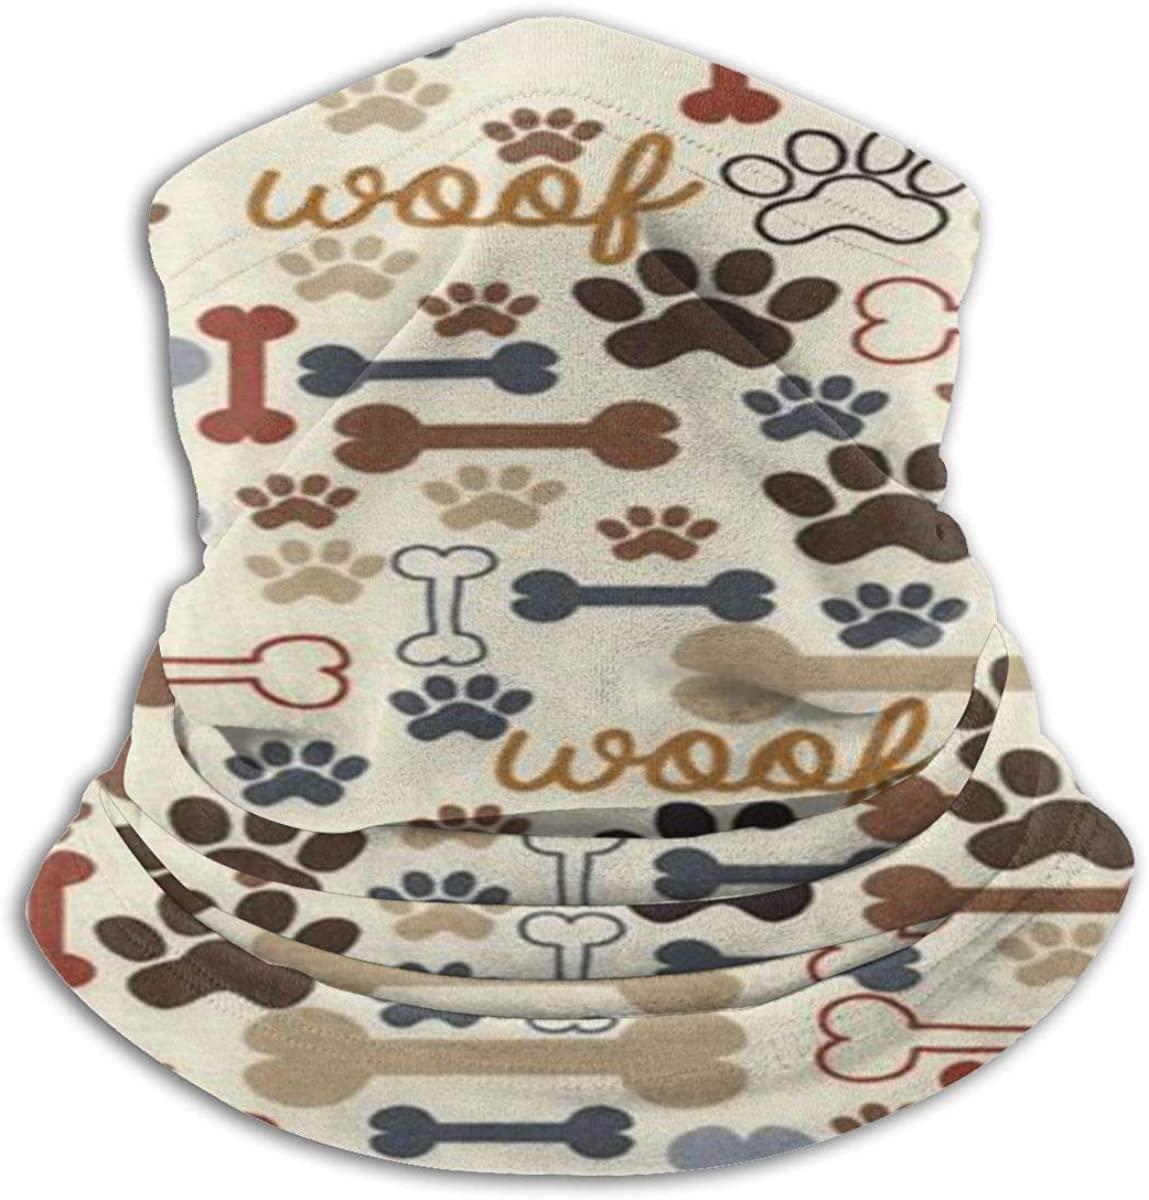 Dog Bones & Paw Prints Balaclava Womens Bandana Mens Balaclava,Neck Warmer,Face Mask,Collars Wristband